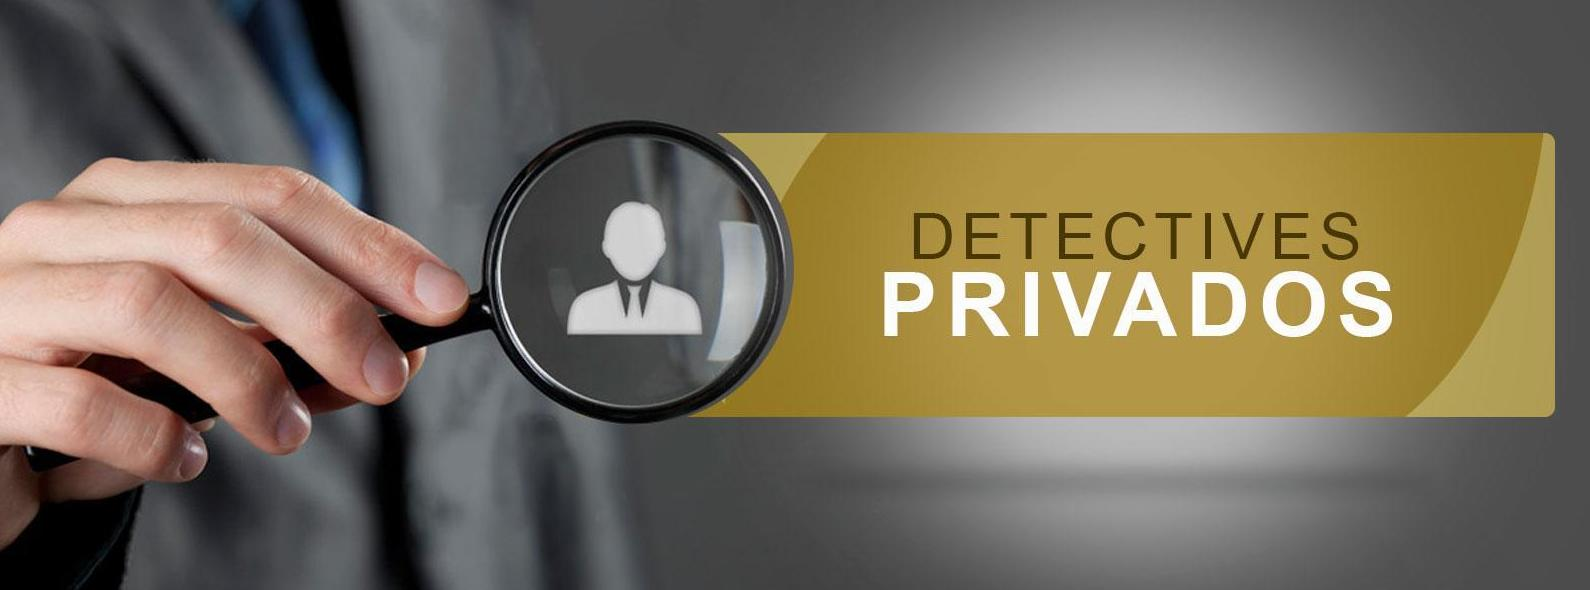 detectives privados en Barcelona